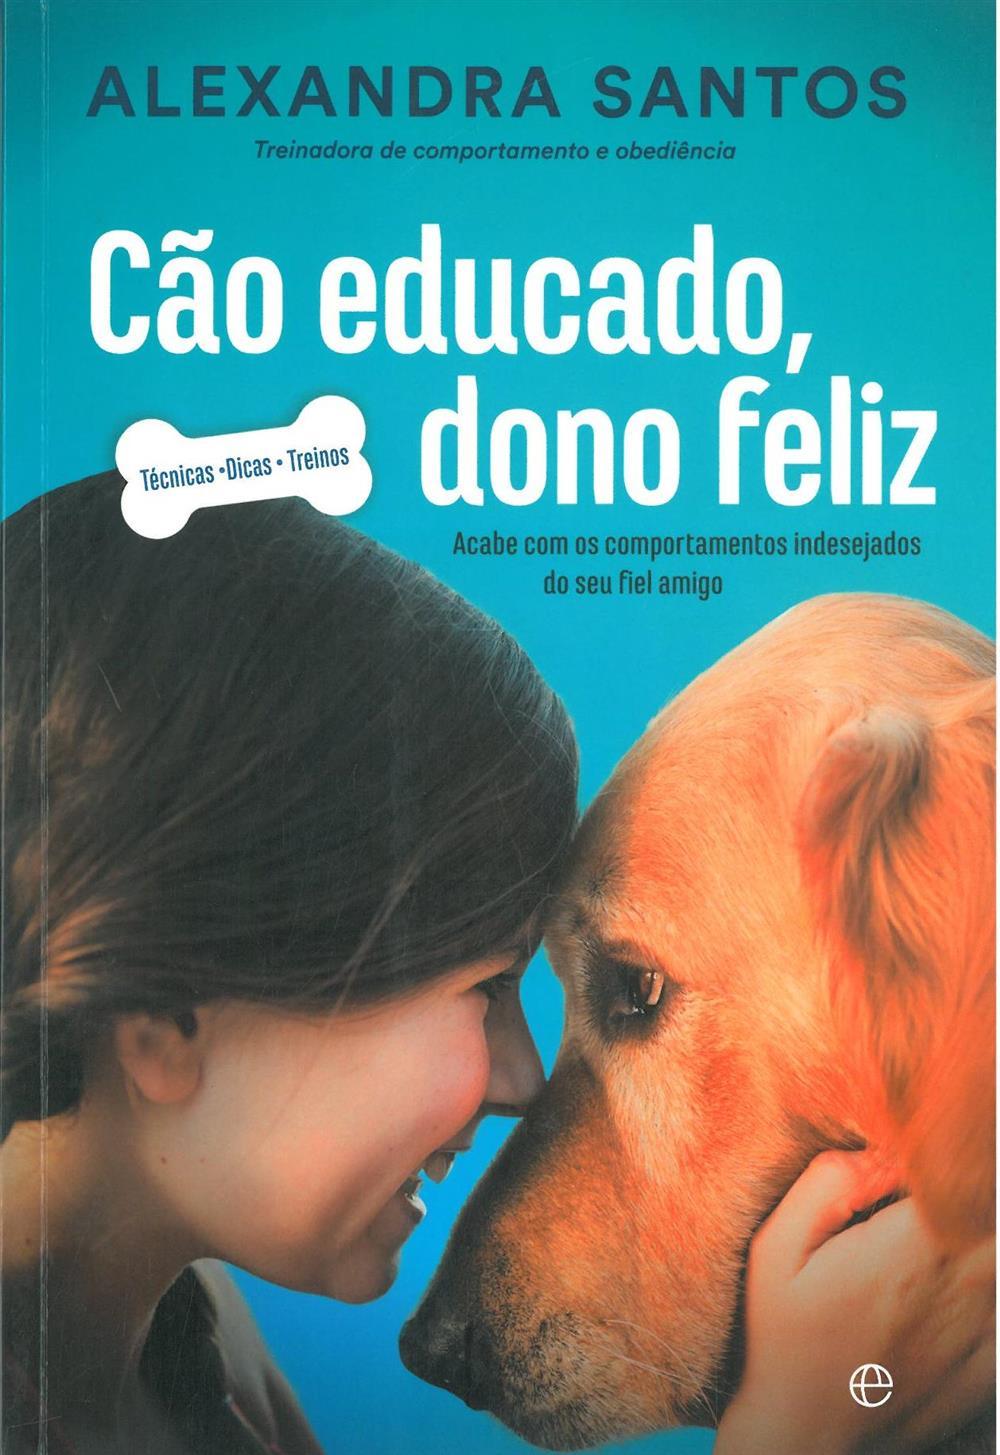 Cão educado, dono feliz.jpg